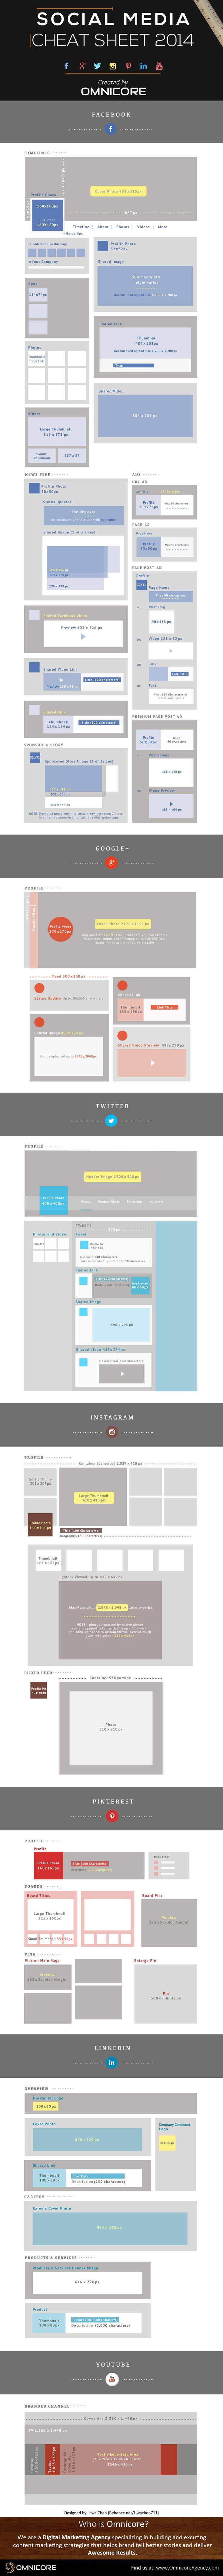 GooglePlus, Twitter, YouTube, LinkedIn - Complete Social Media Sizing Cheat Sheet - infographic